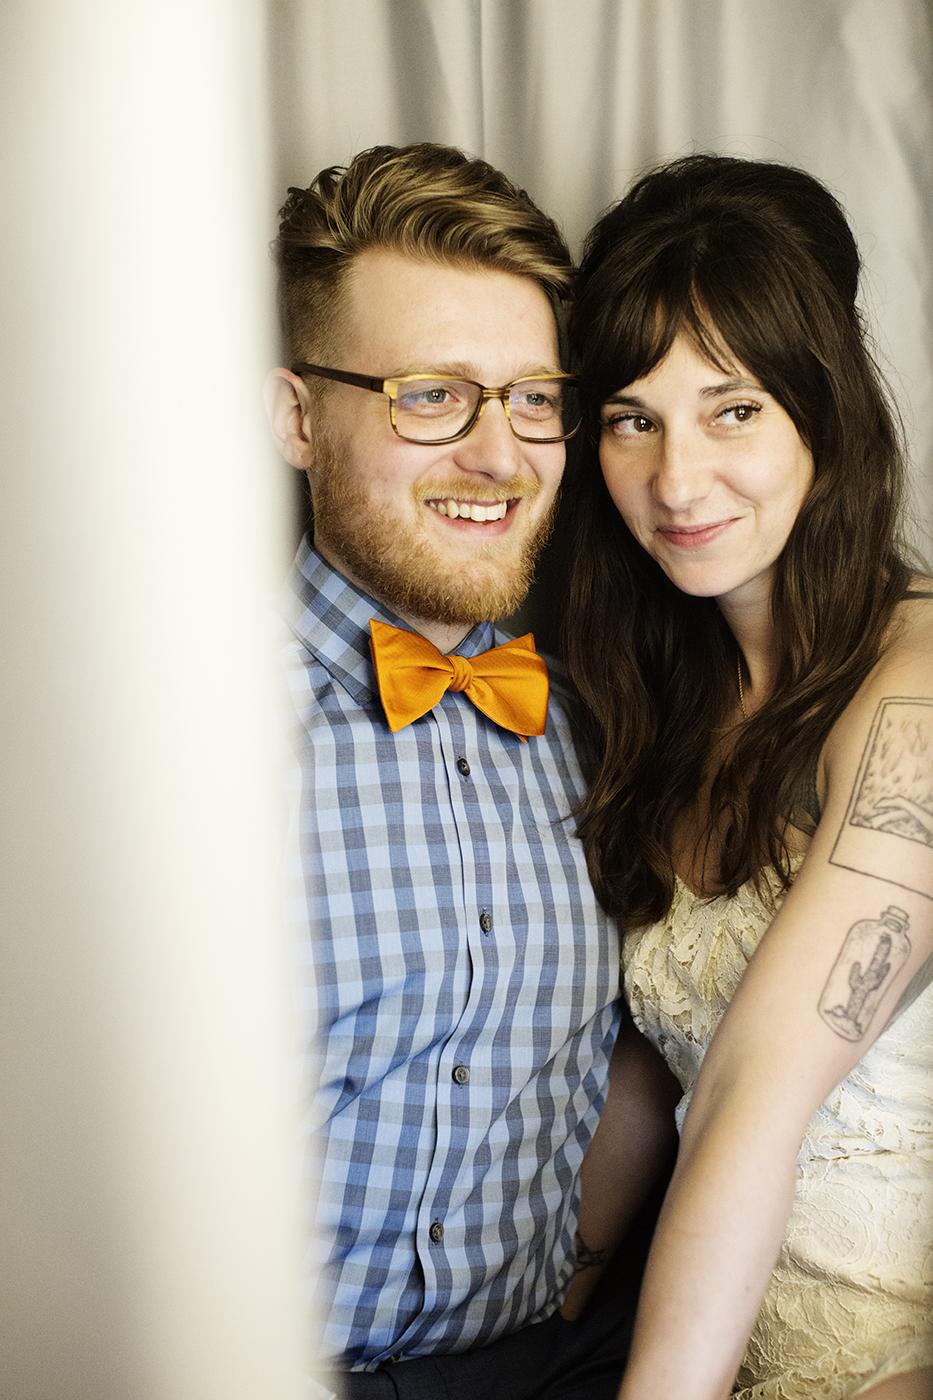 Solar Arts by Chowgirls | Minneapolis Wedding Photographer | Photogen Inc. | Eliesa Johnson